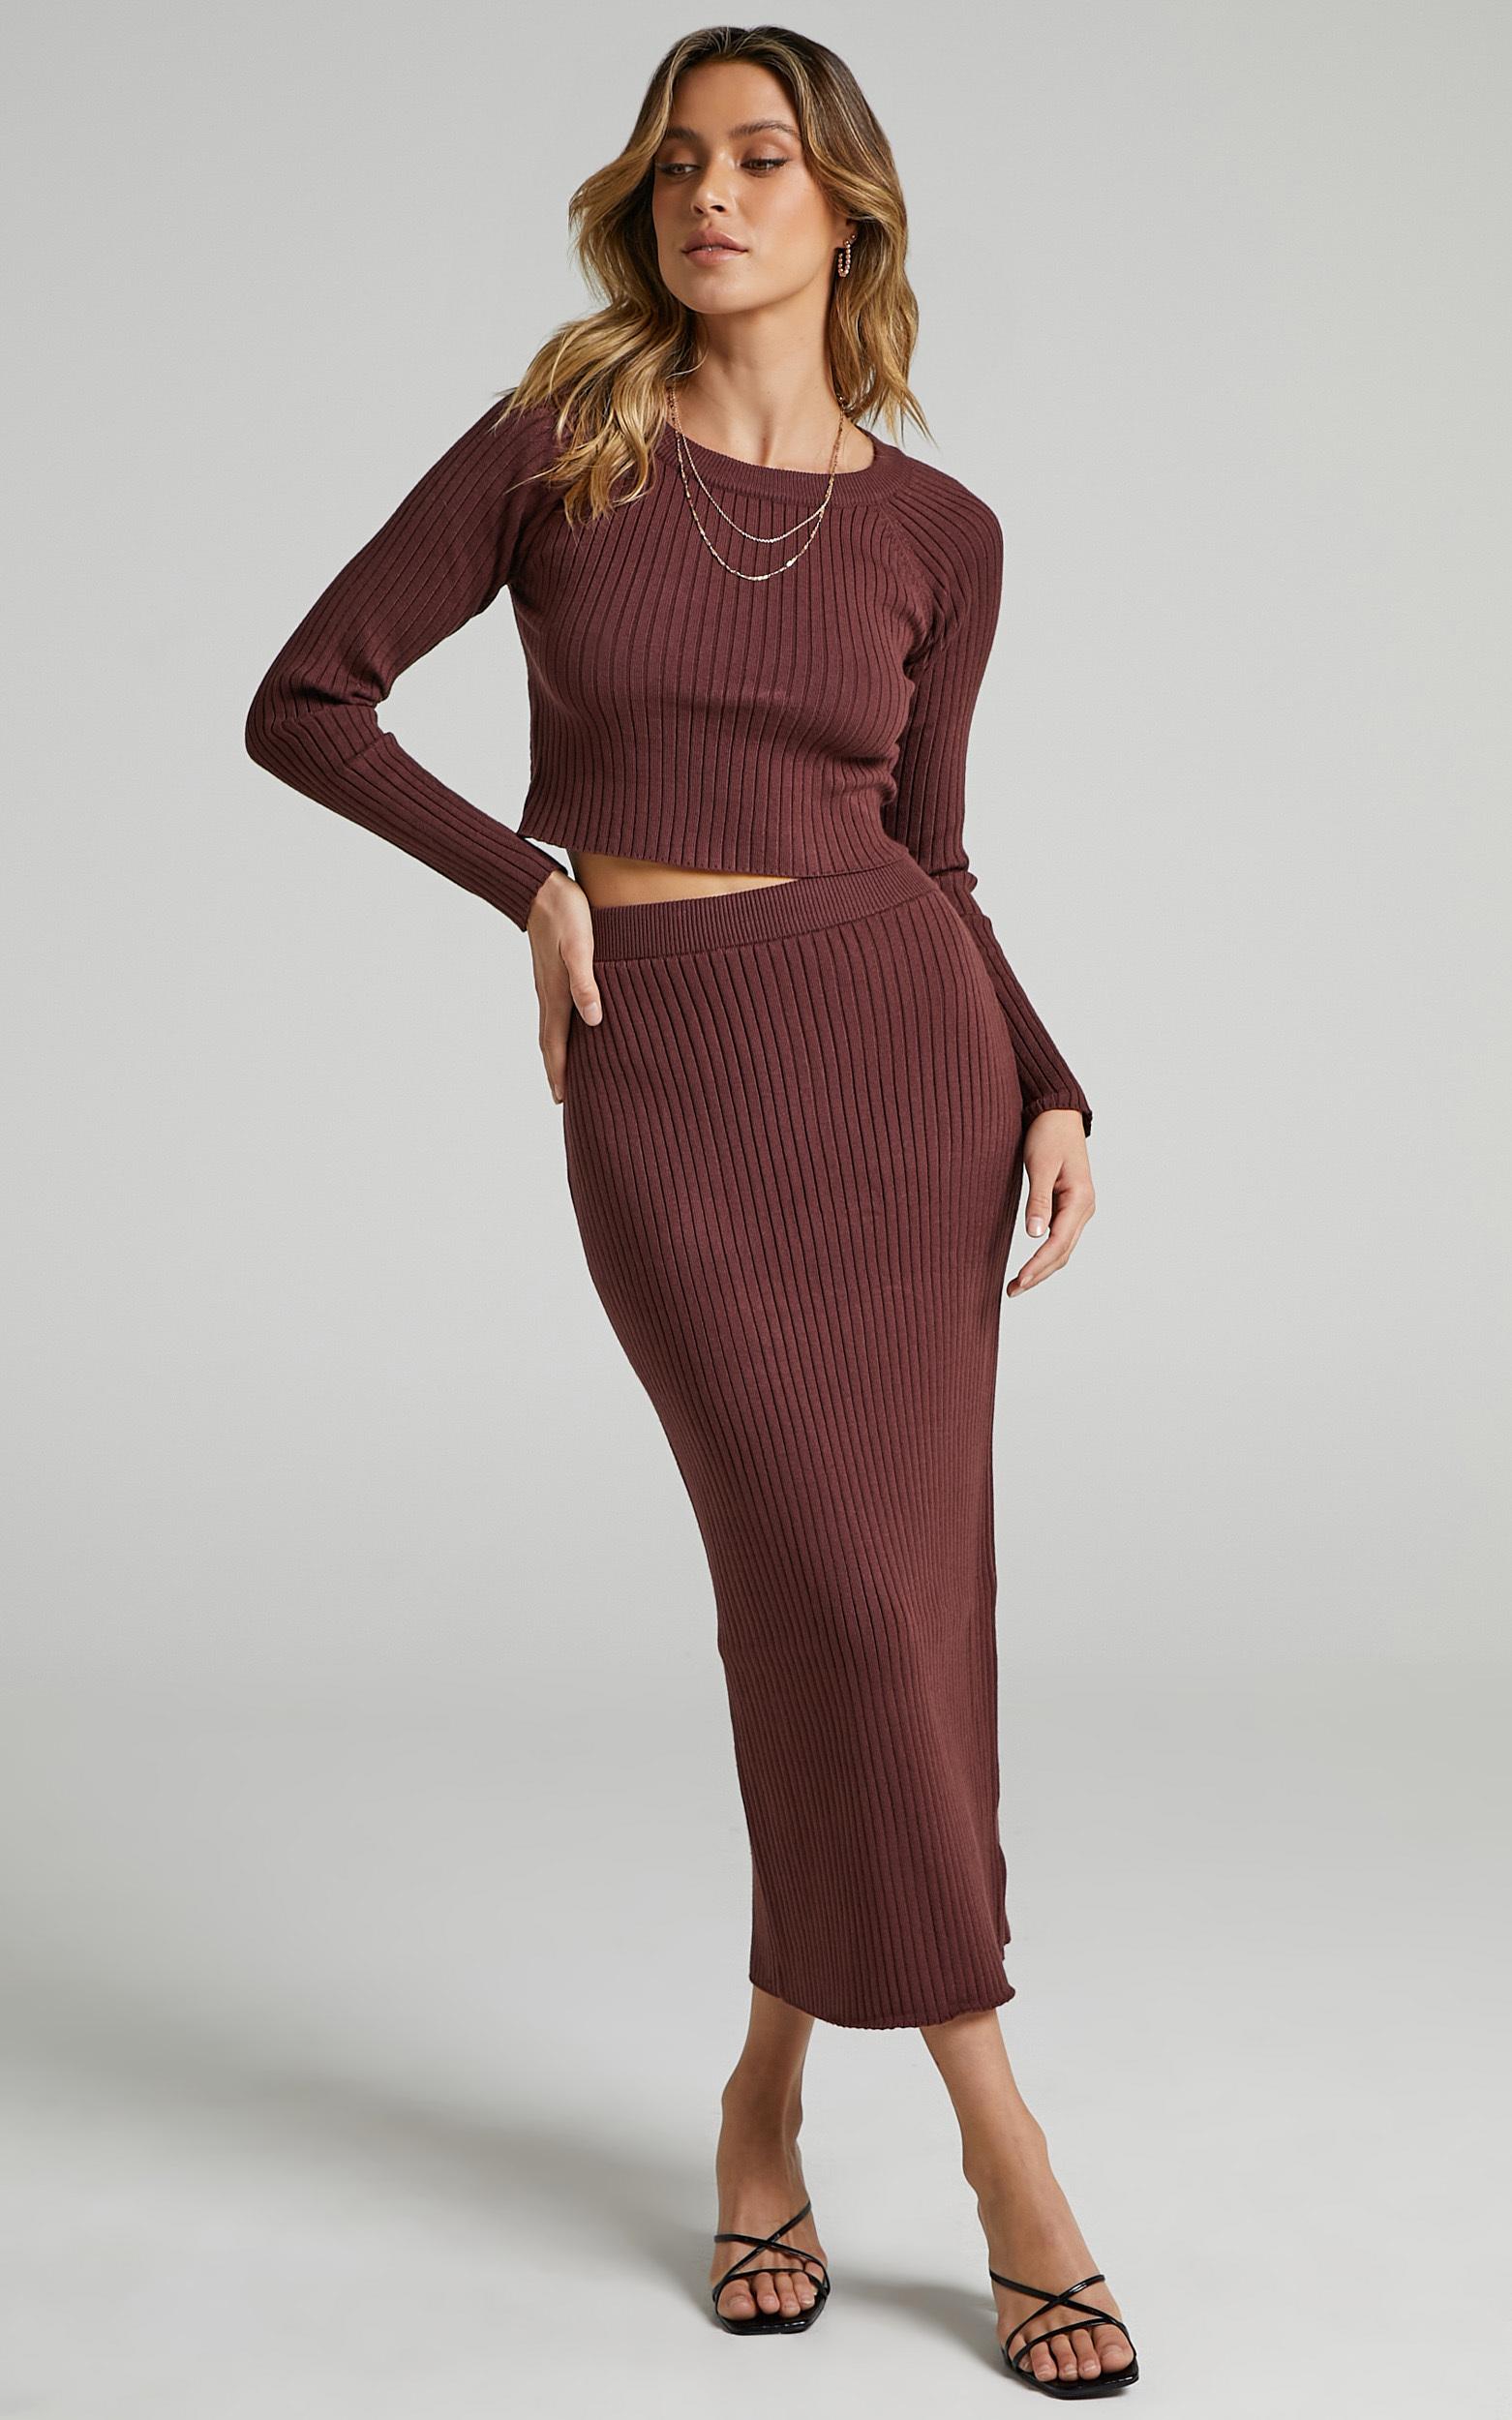 Yolanda Midi Knit Skirt in Chocolate - L, BRN1, hi-res image number null